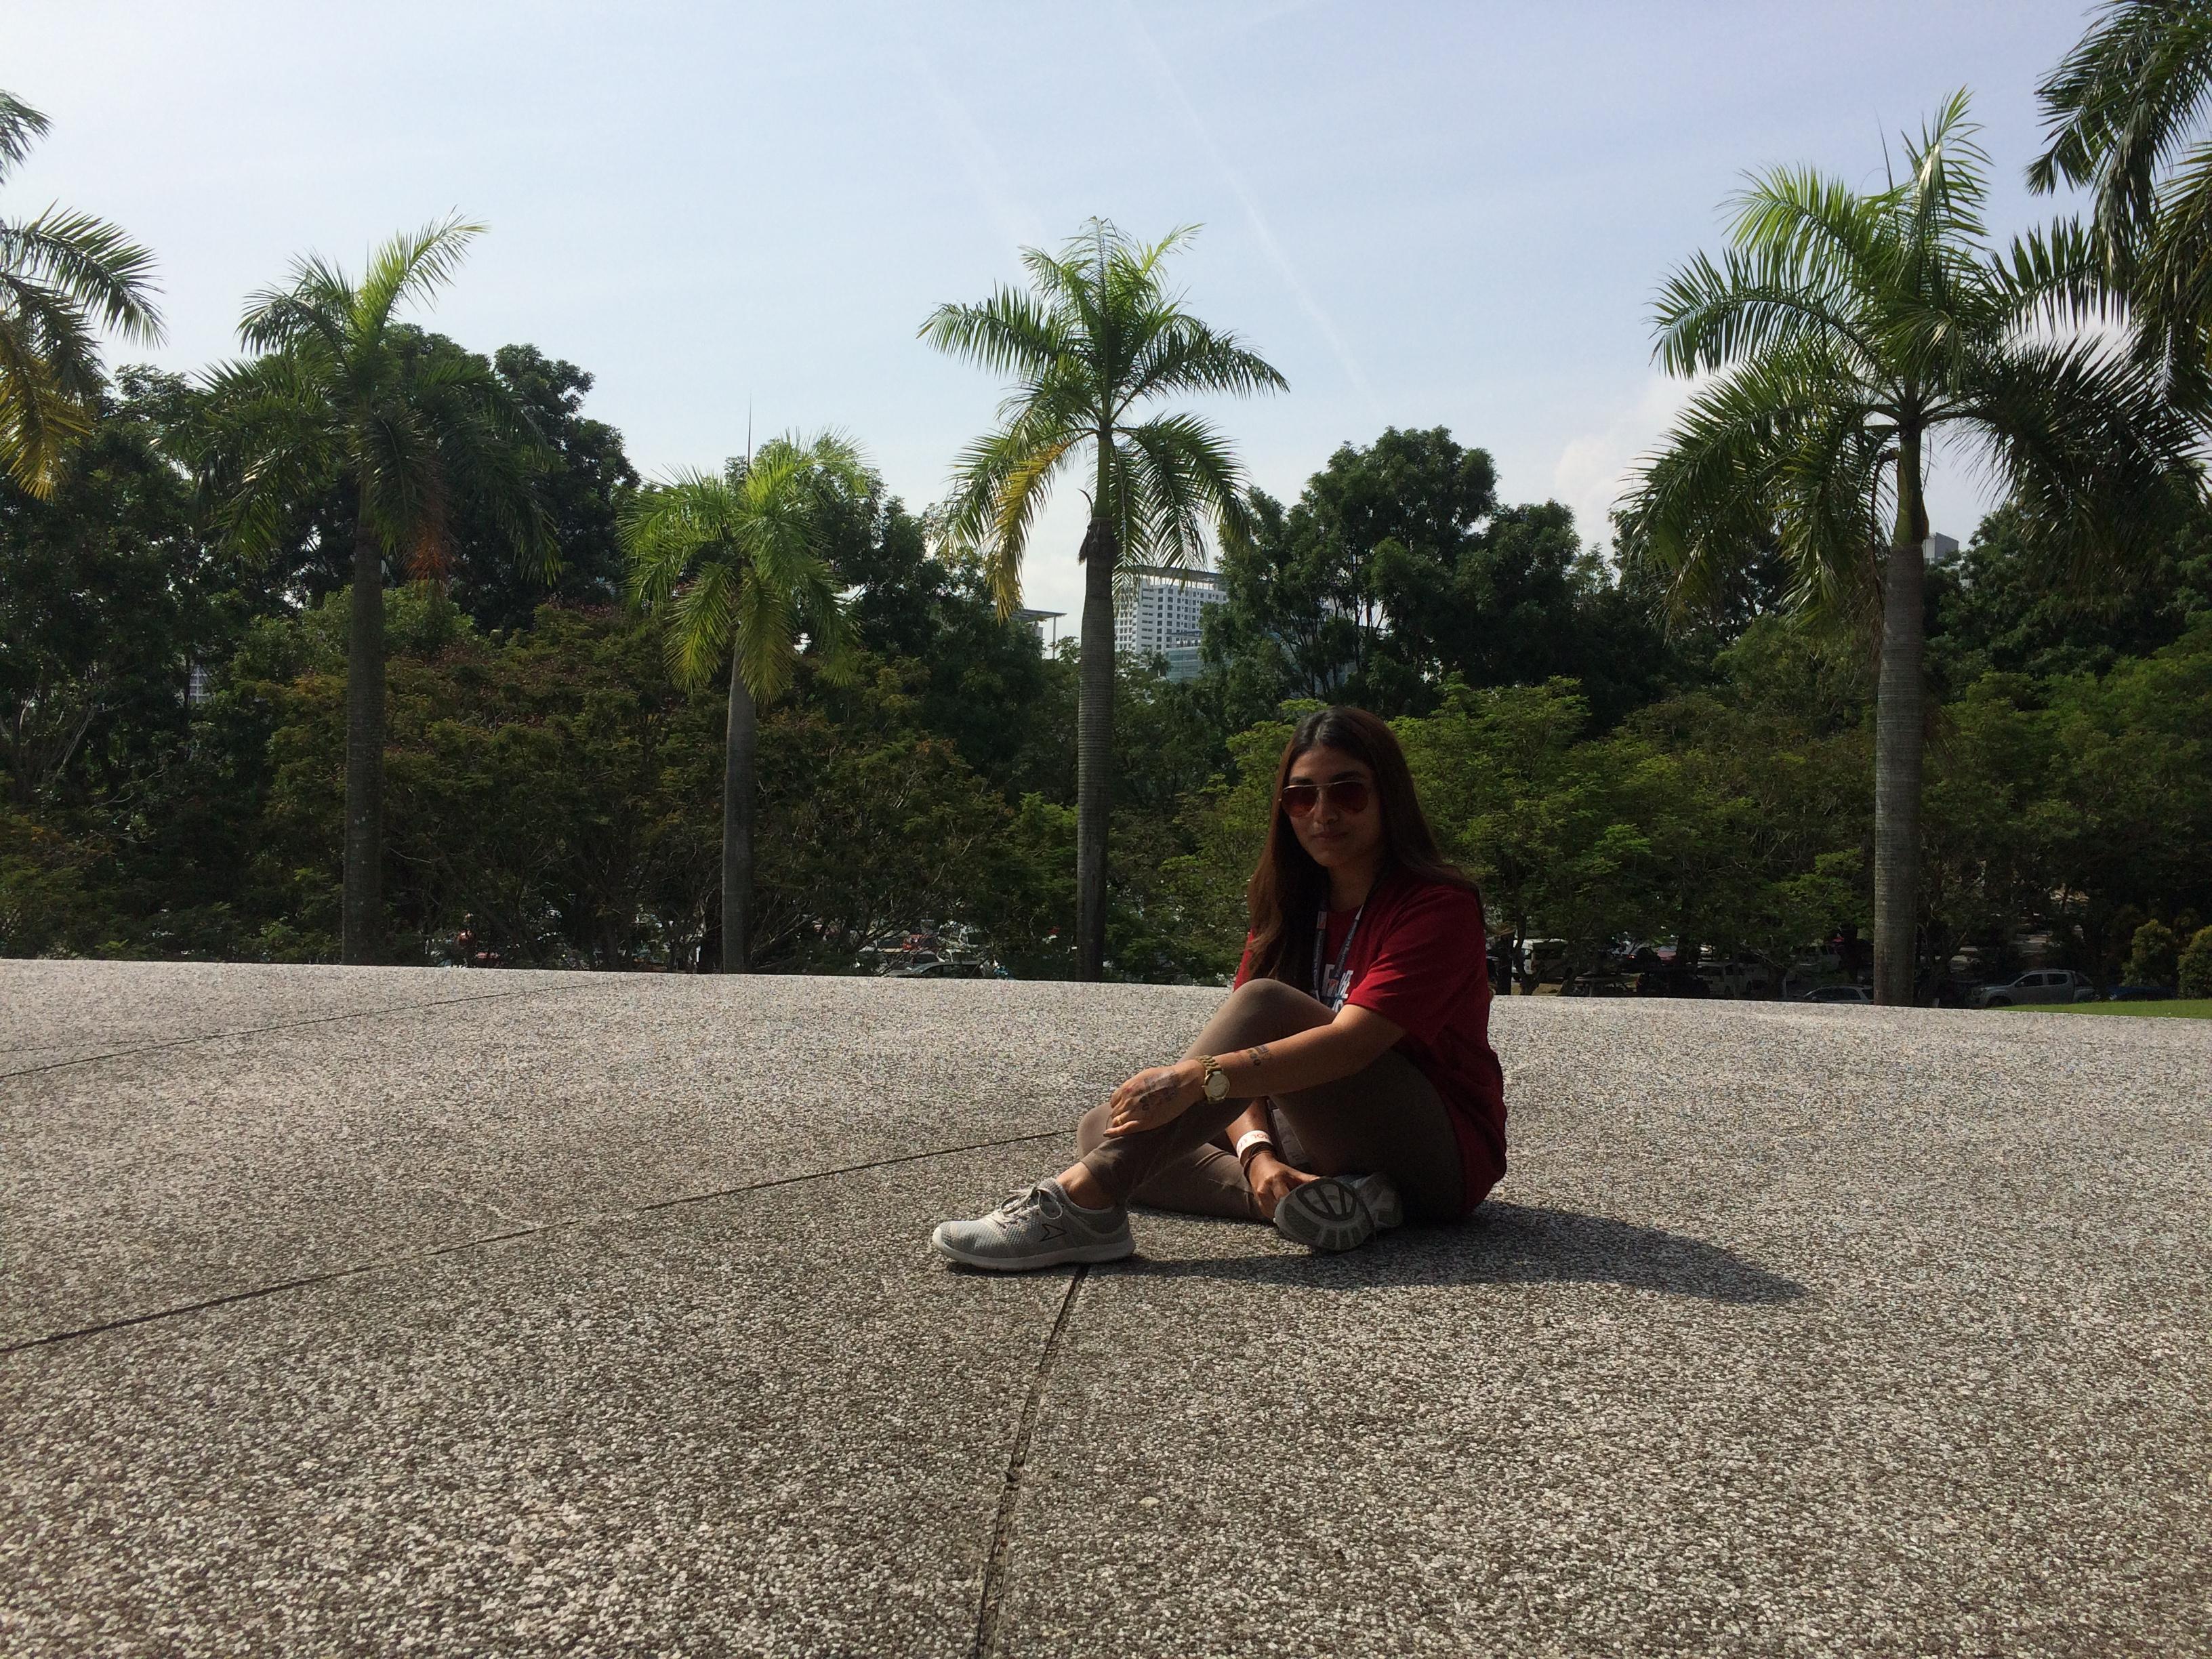 Outside the Melawati Stadium